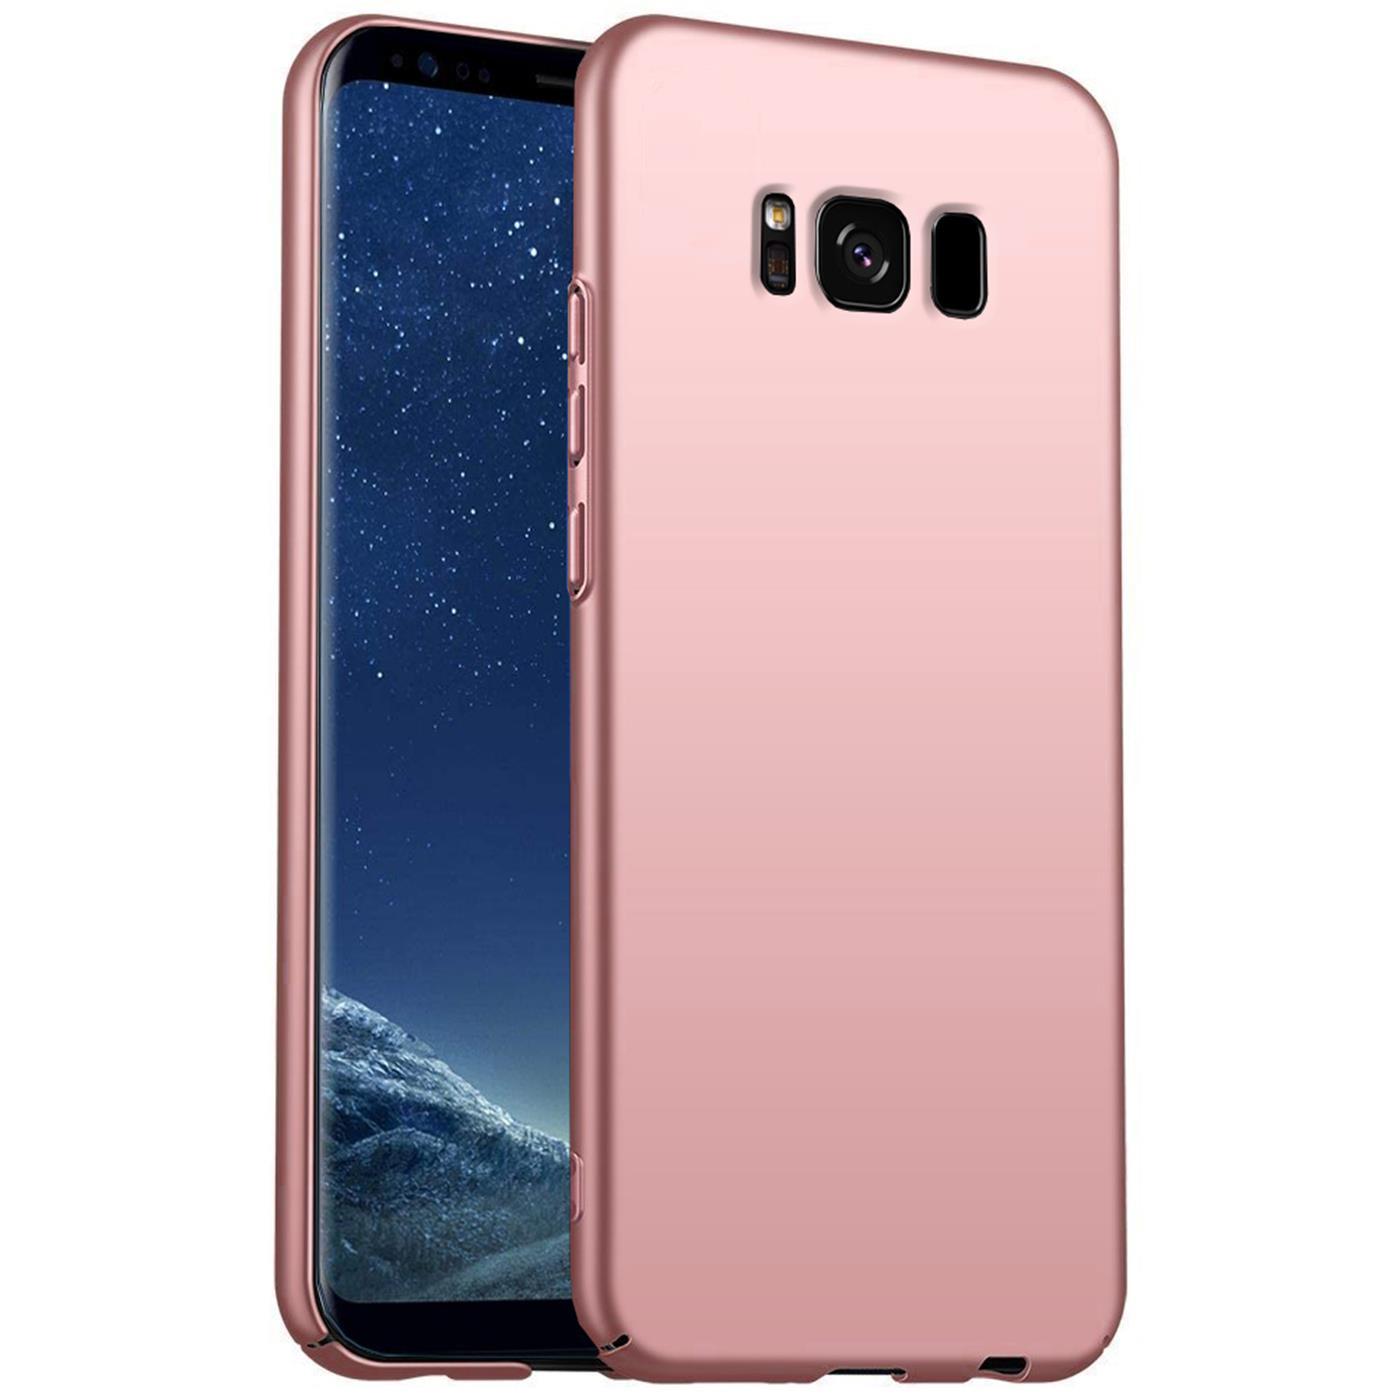 Hard-Back-Case-Cover-Samsung-Galaxy-s4-duenn-Cover-Slim-Shockproof-Rugged Indexbild 18